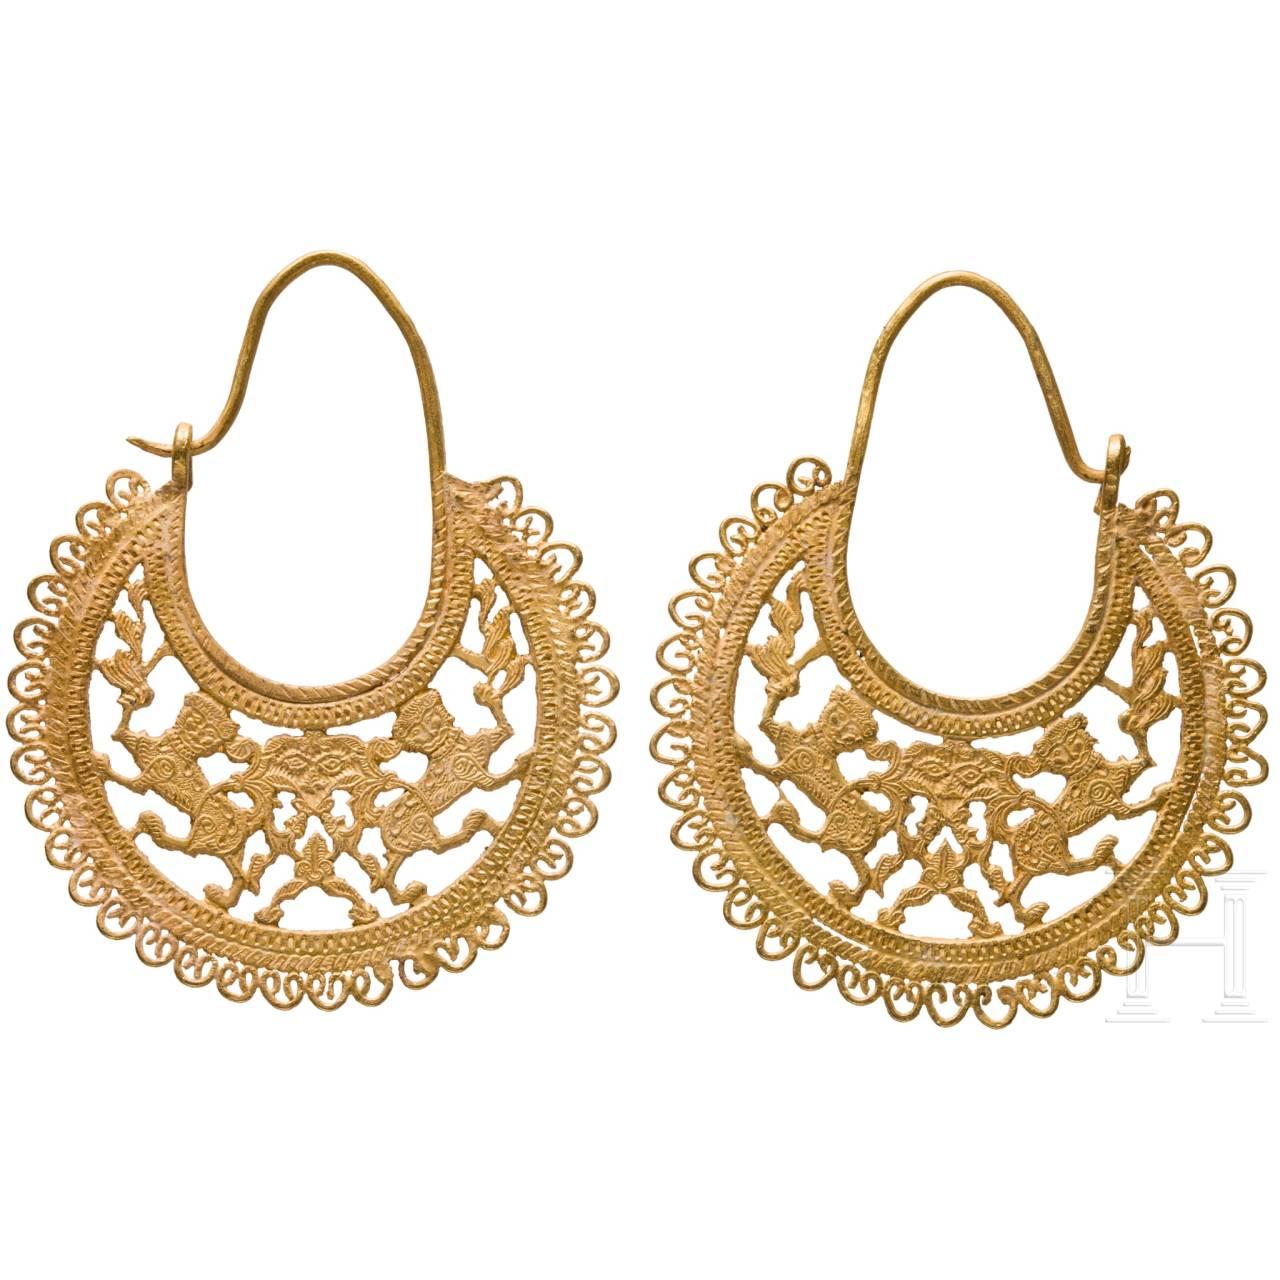 A pair of golden Seljuk earrings, 13th century